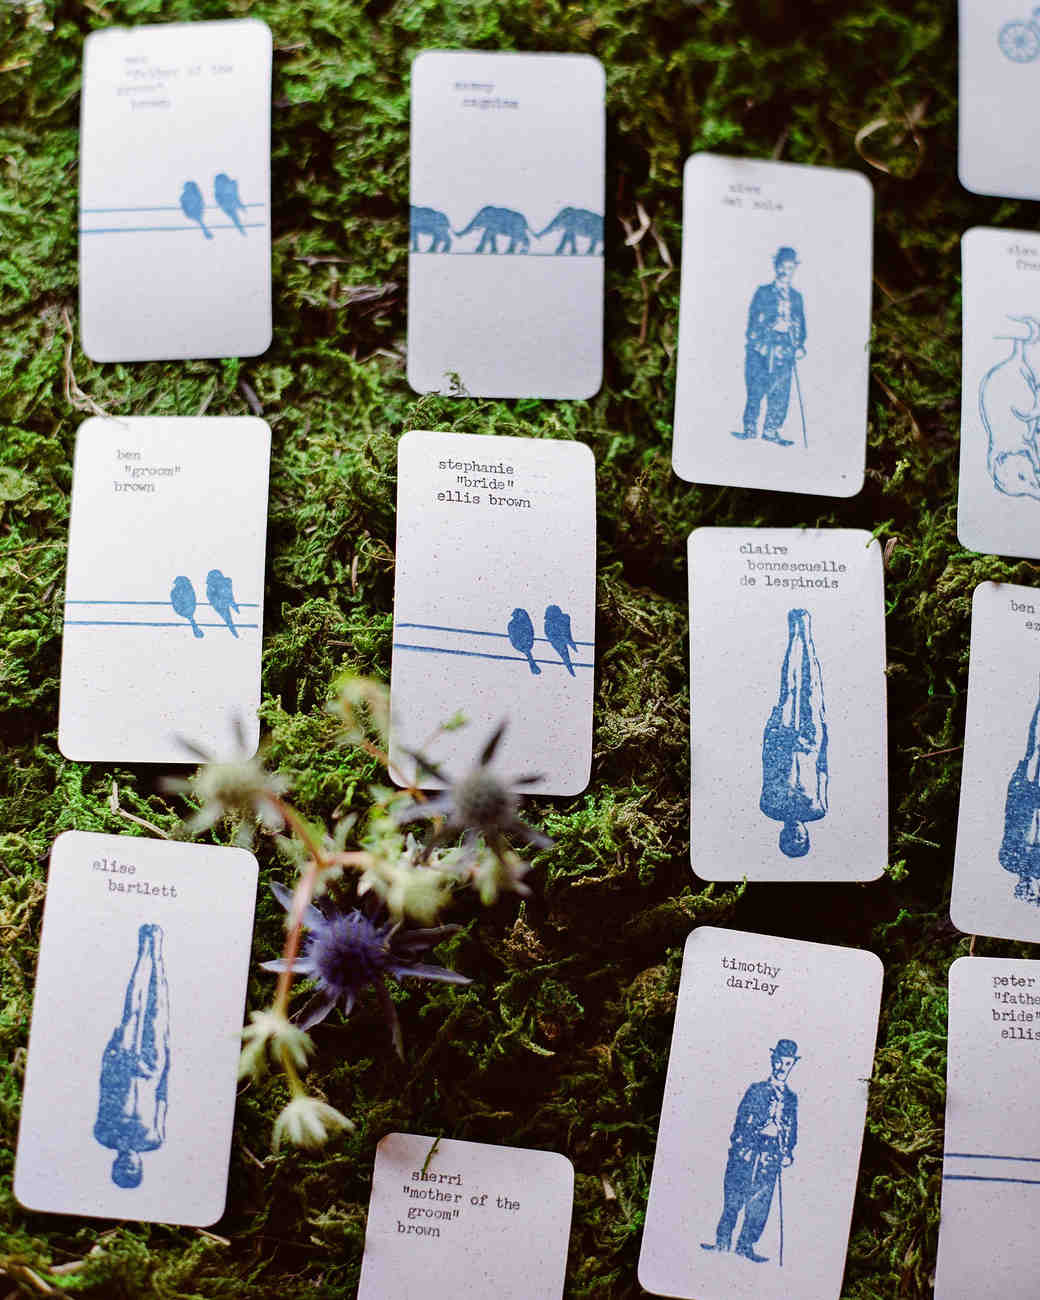 rw-stephanie-ben-cards.jpg